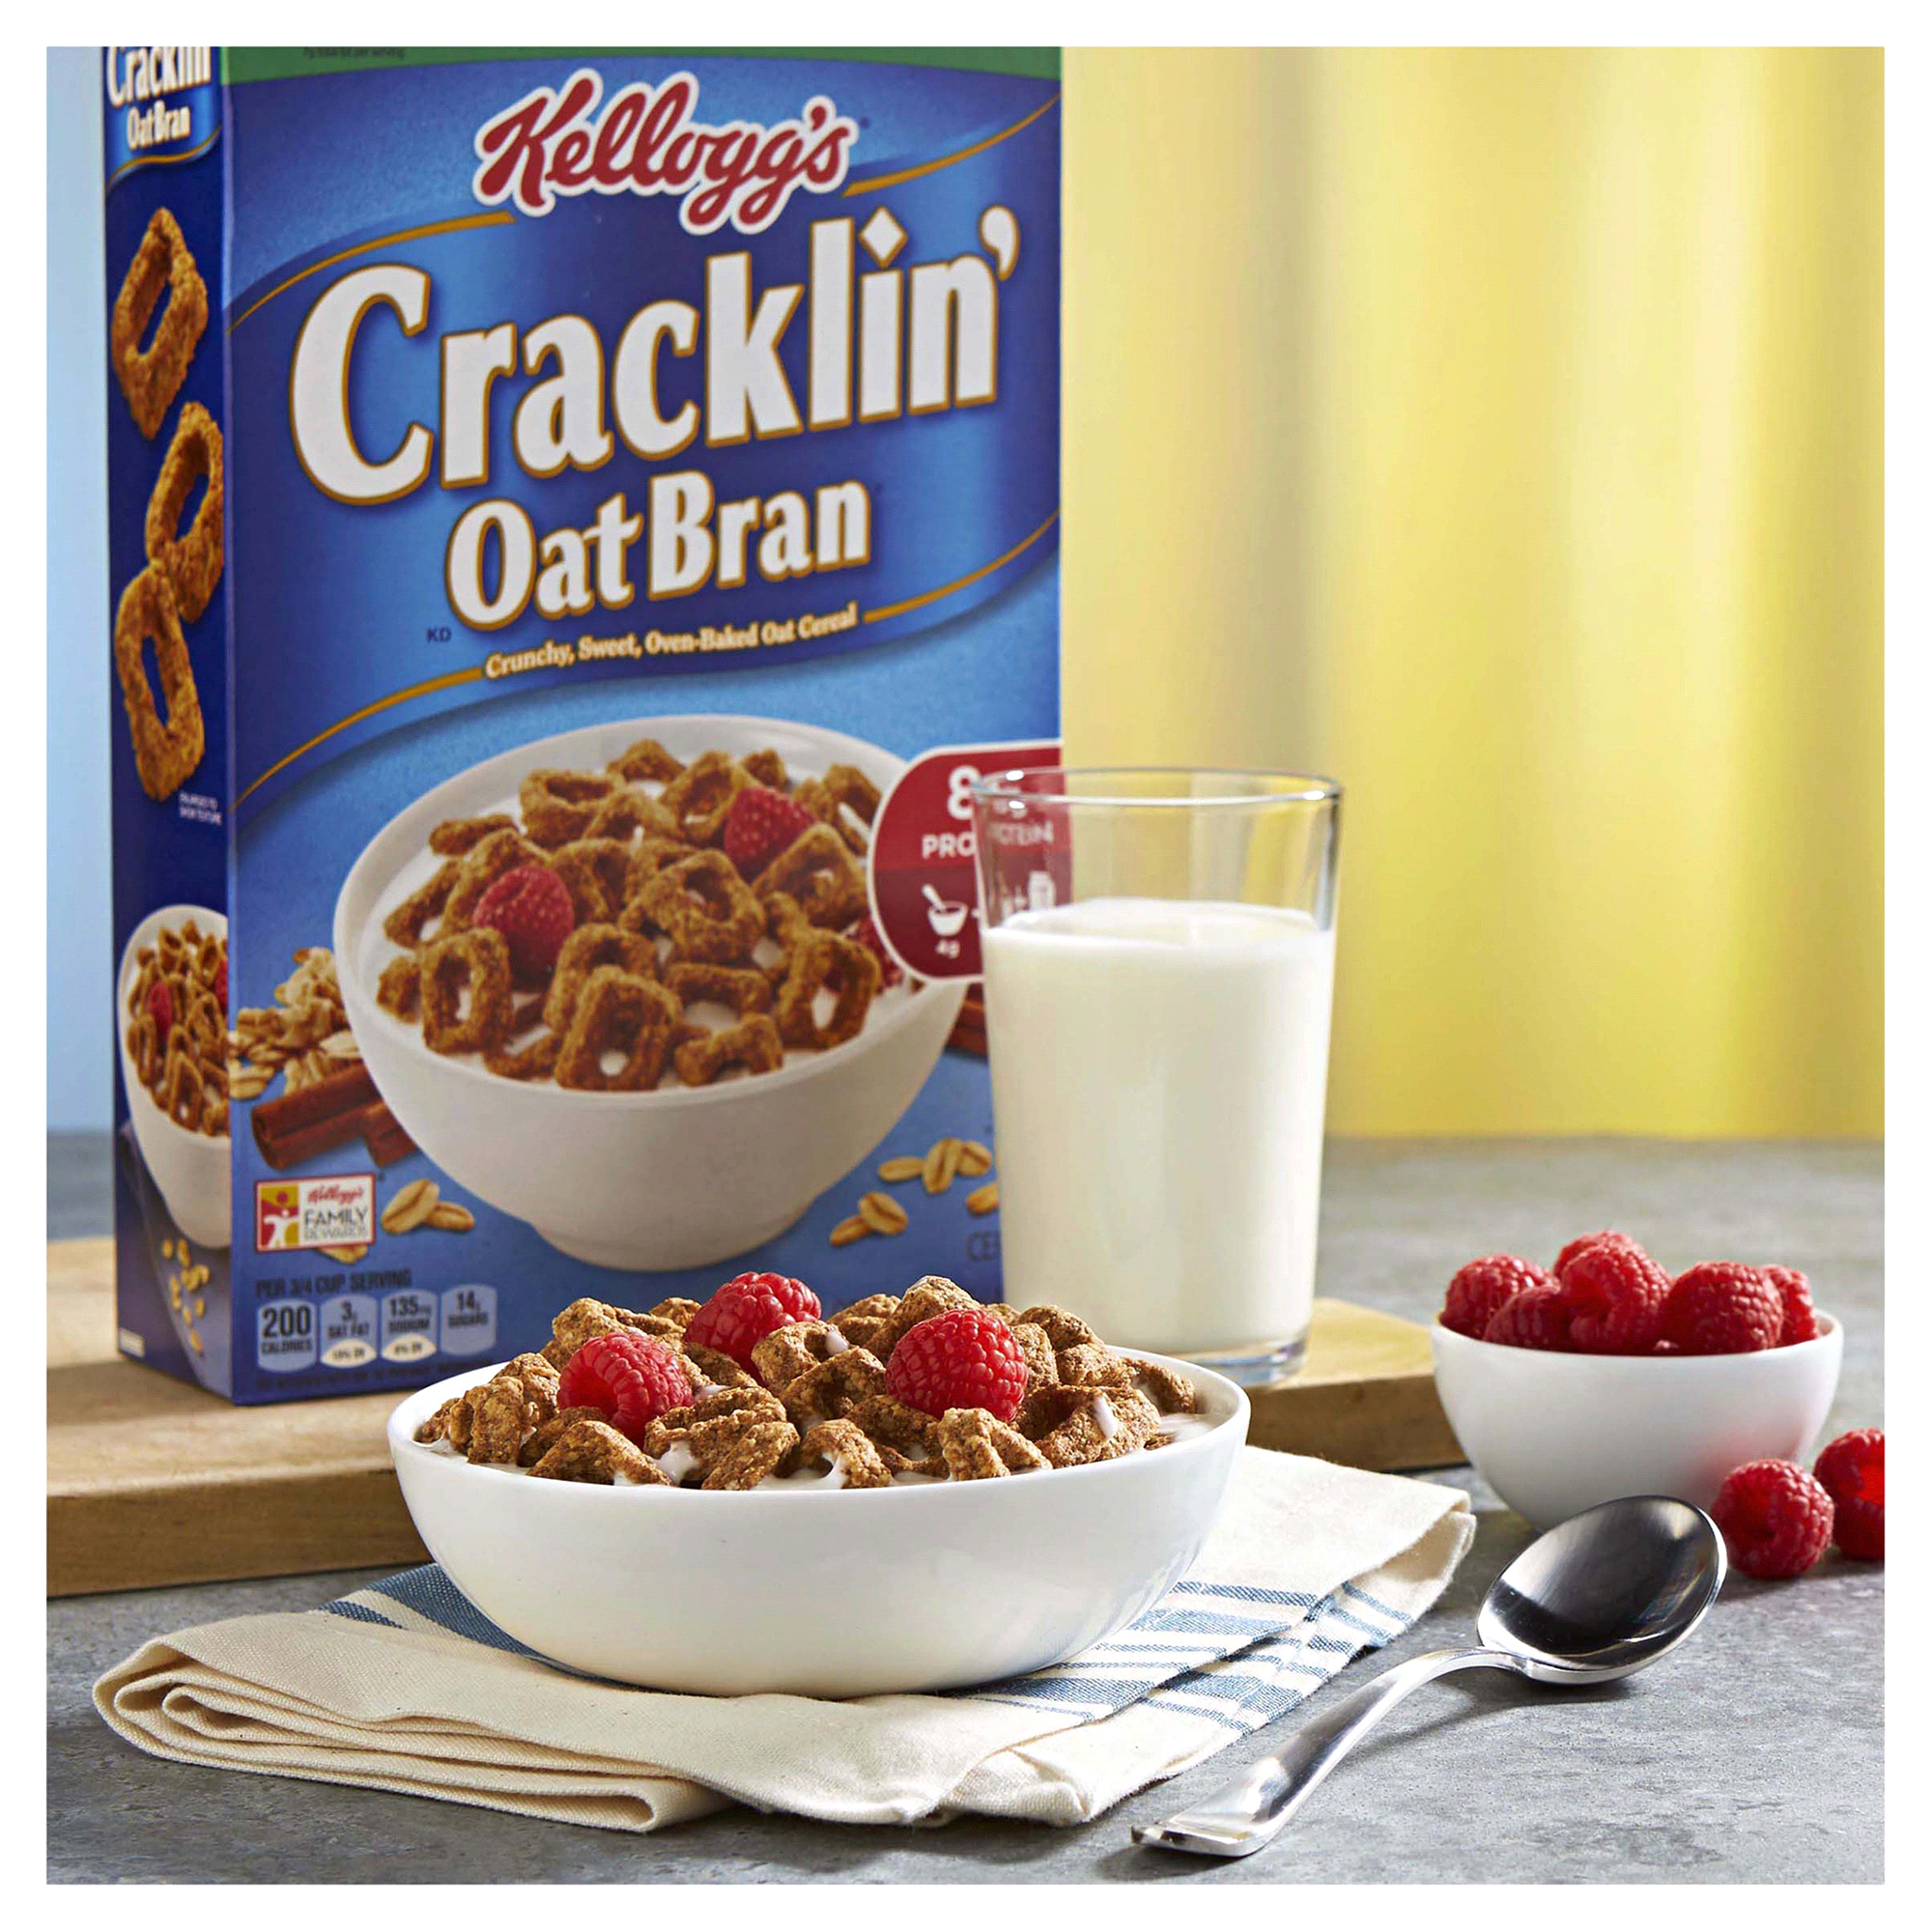 Cracklin oat bran online dating